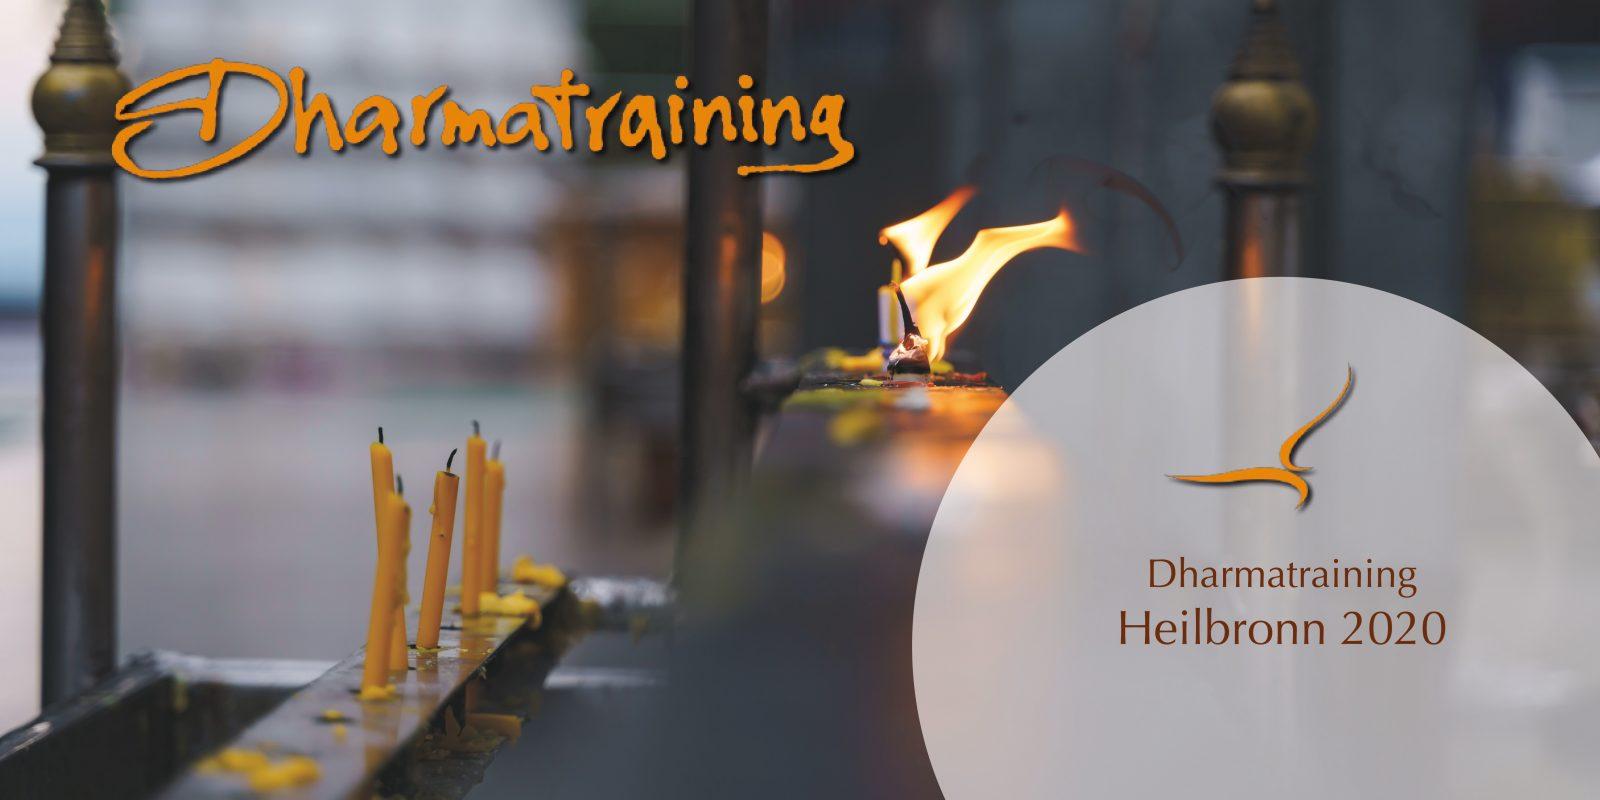 Dharmatraining | Heilbronn 2020